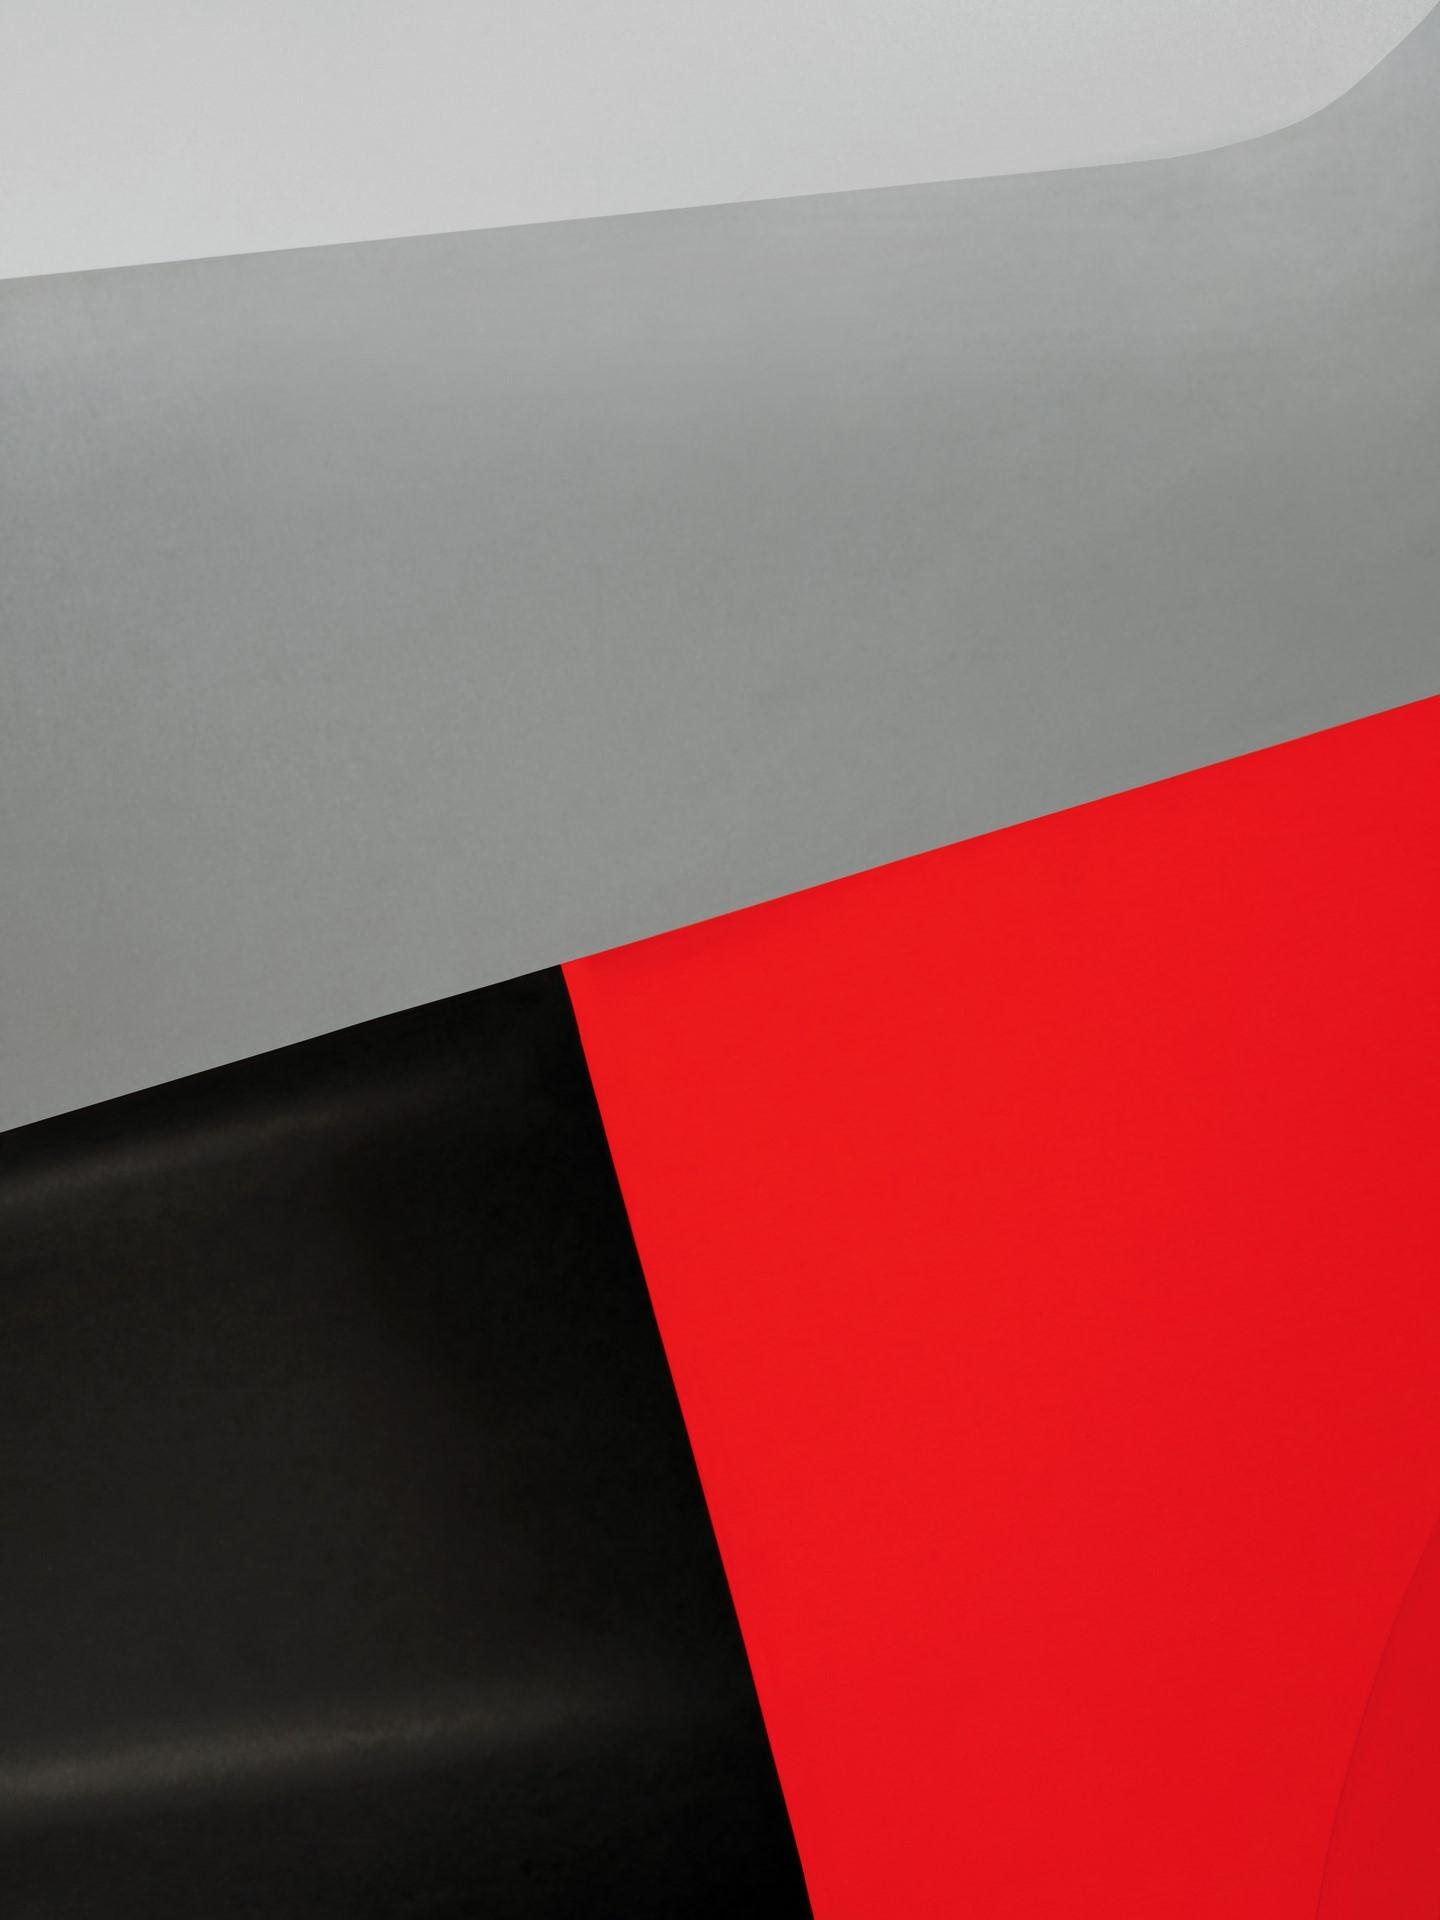 BMW-Vision-M-Next-Concept-teasers-4